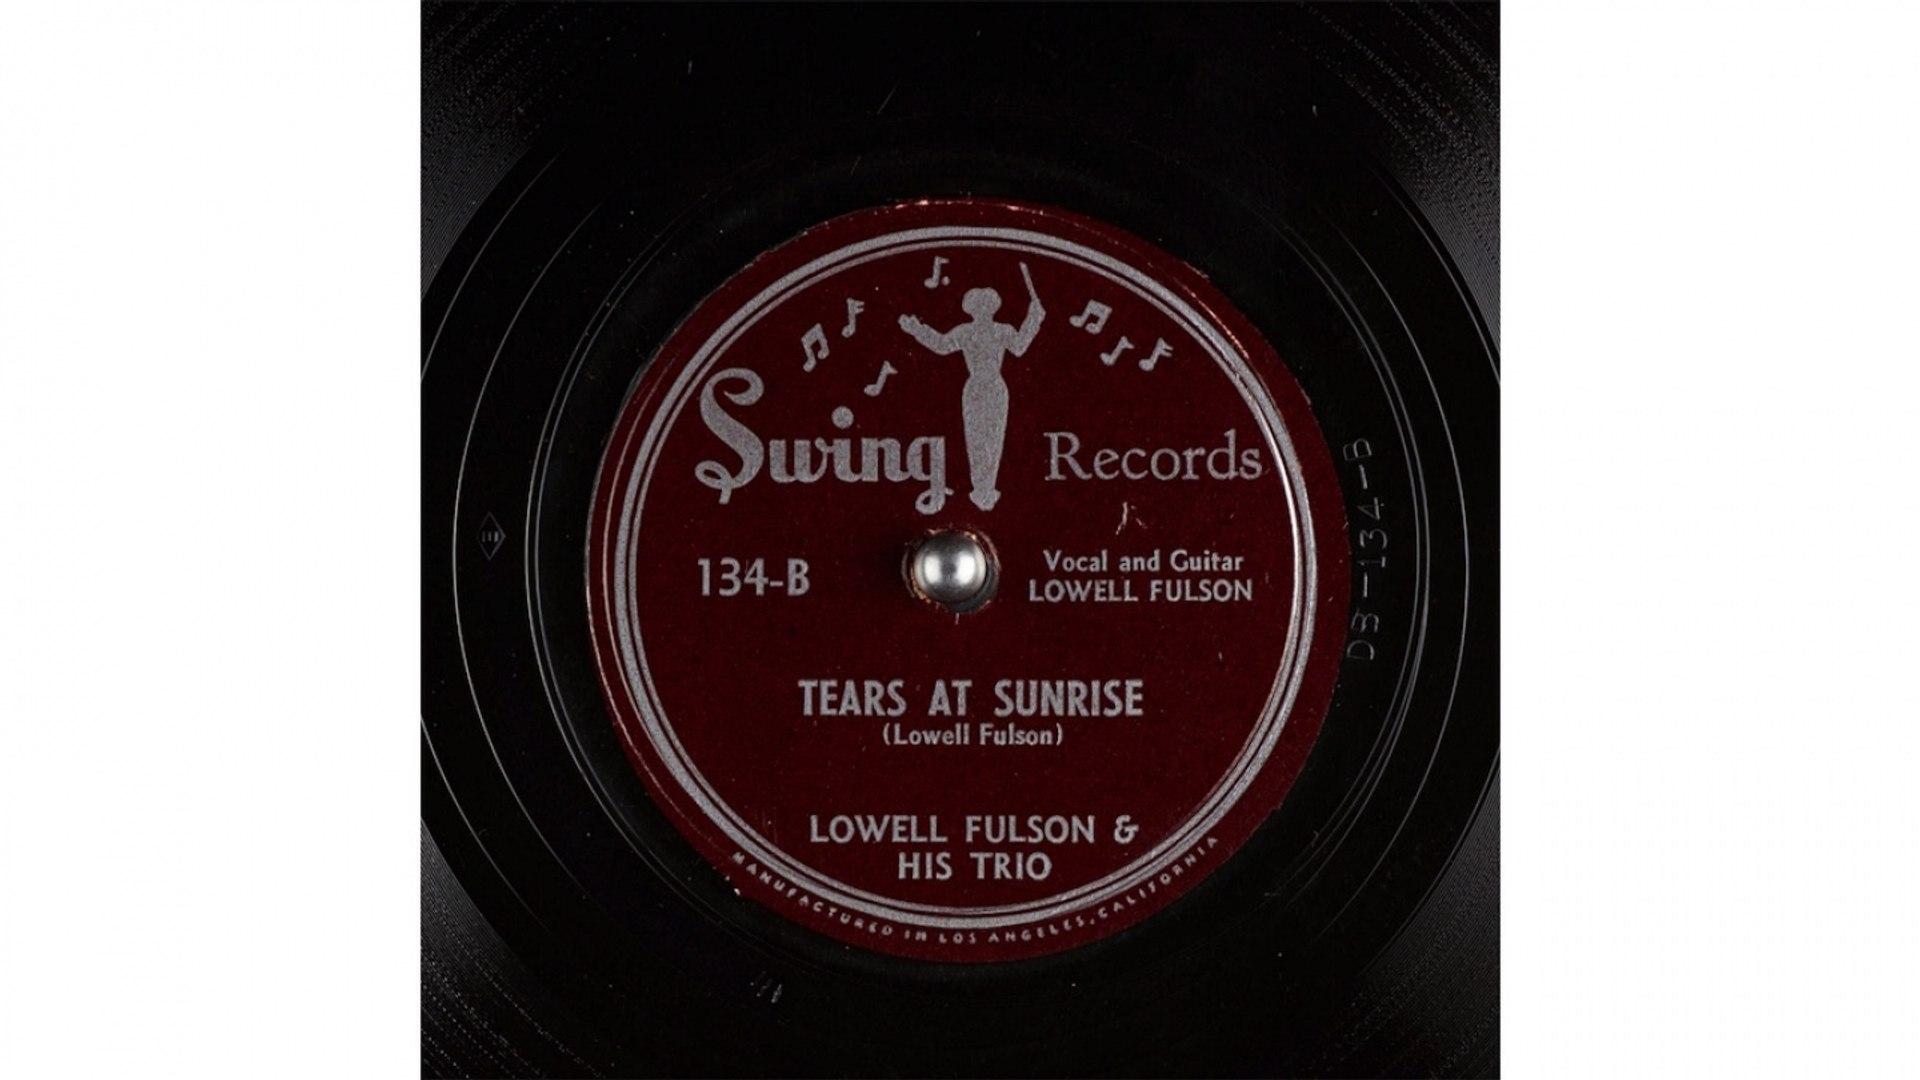 Lowell Fulson & His Trio - Tears at Sunrise (1948)